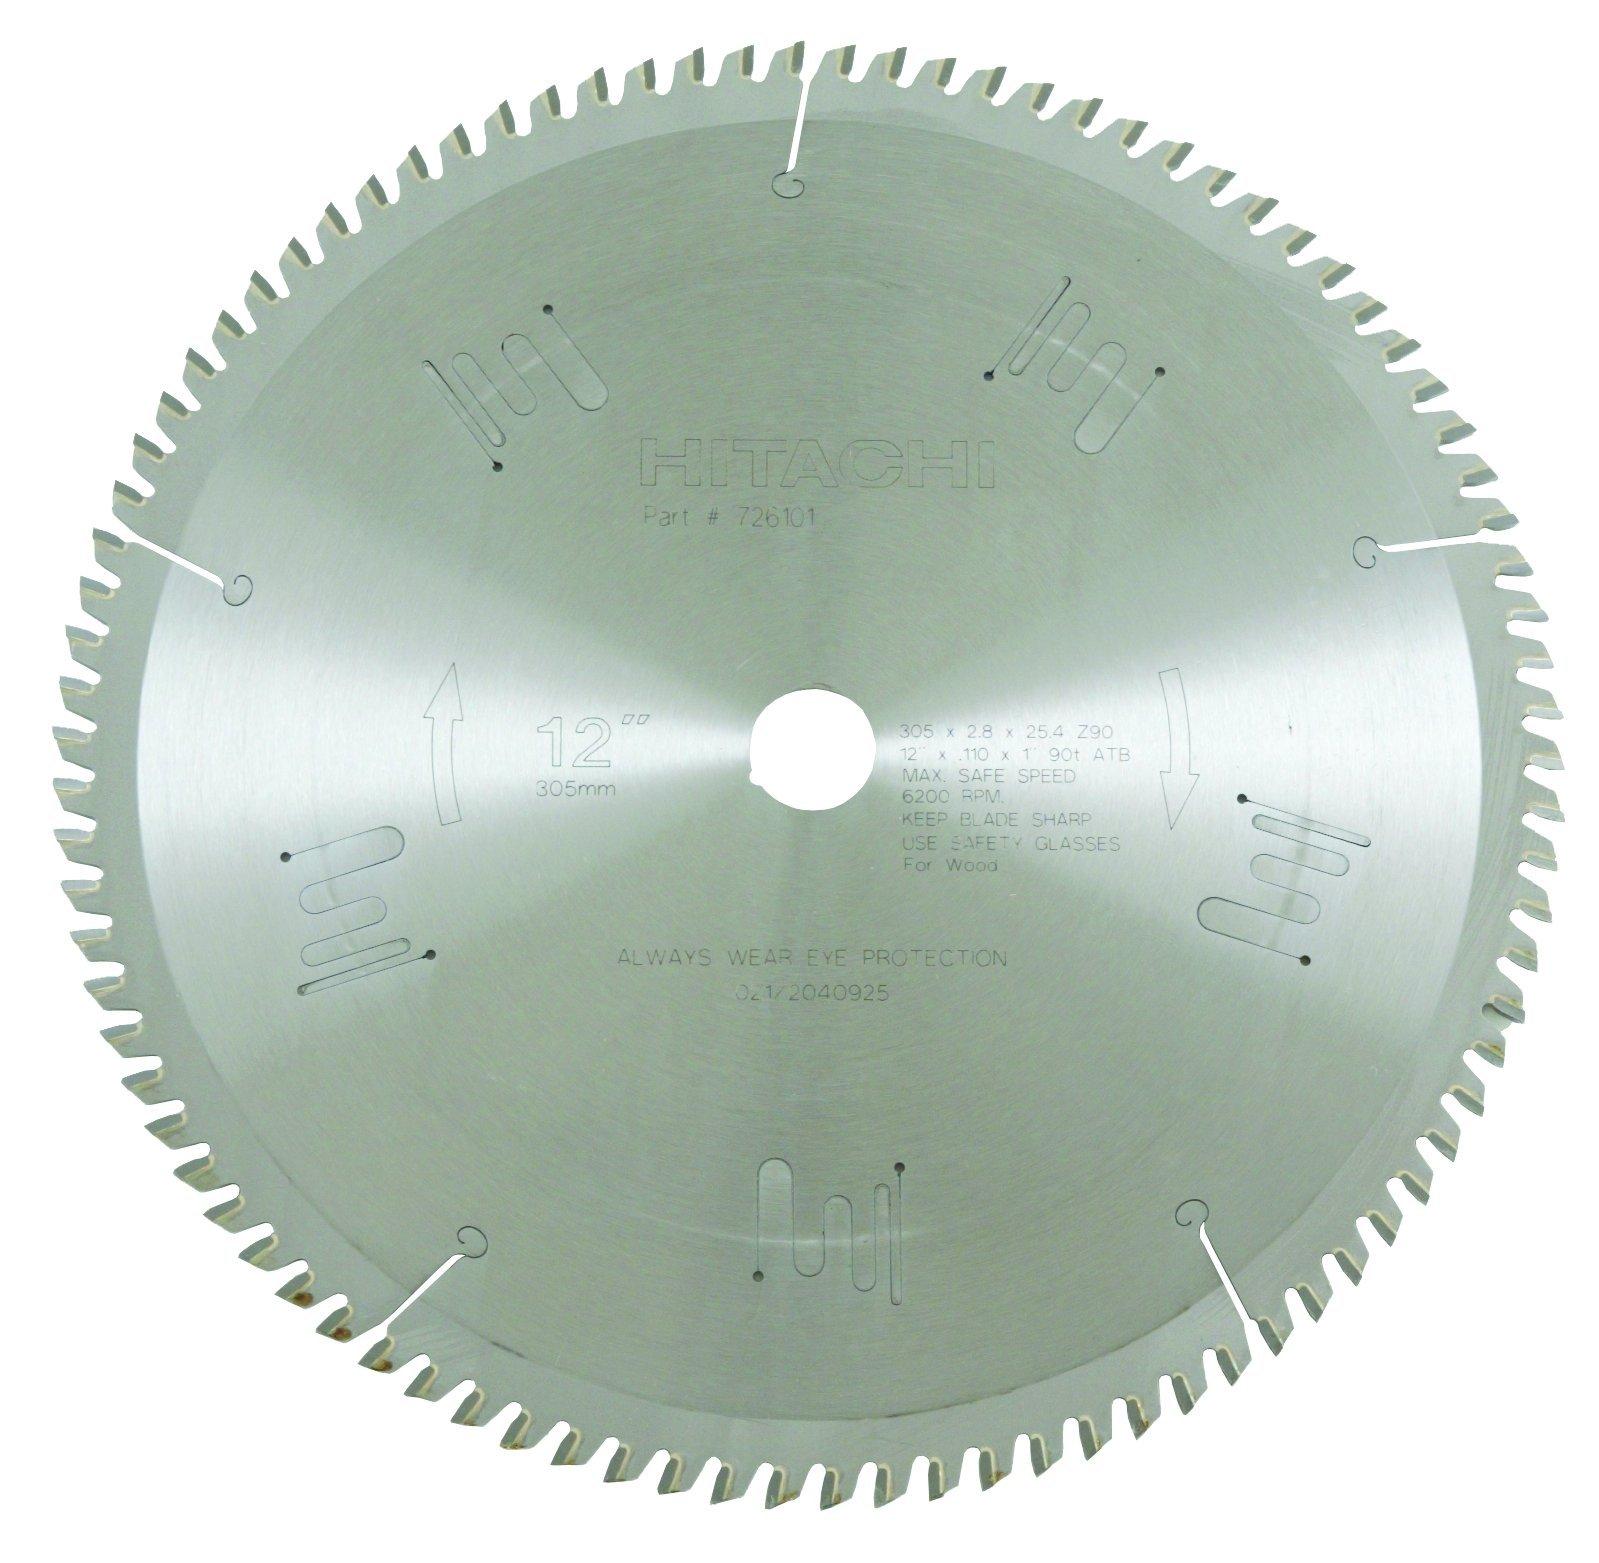 Hitachi 726101 90-Teeth Tungsten Carbide Tipped 12-Inch ATB 1-Inch Arbor Finish Saw Blade by Hitachi